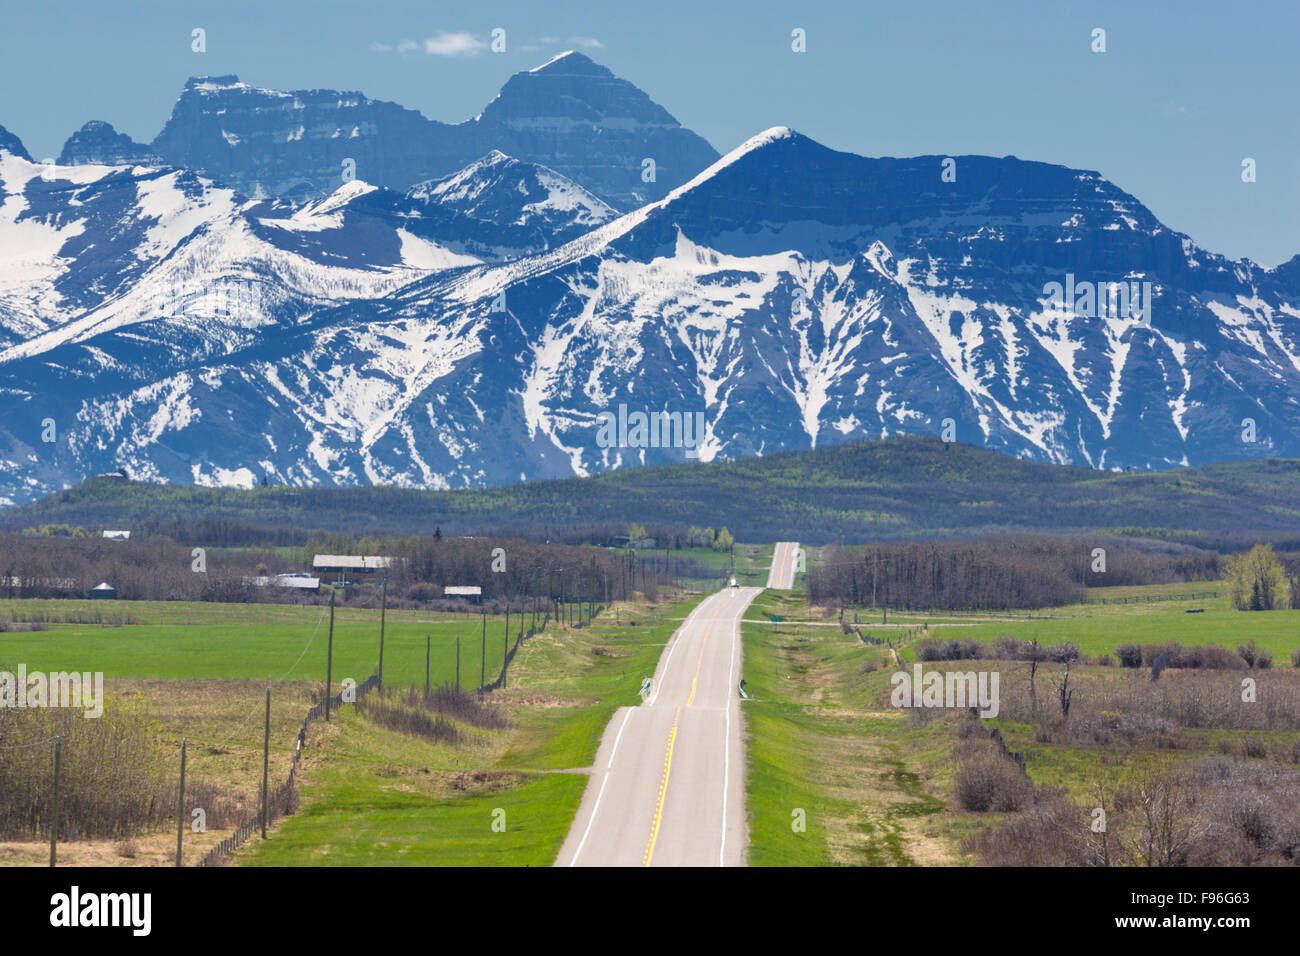 Highway, Twin Butte, Alberta, Canada - Stock Image